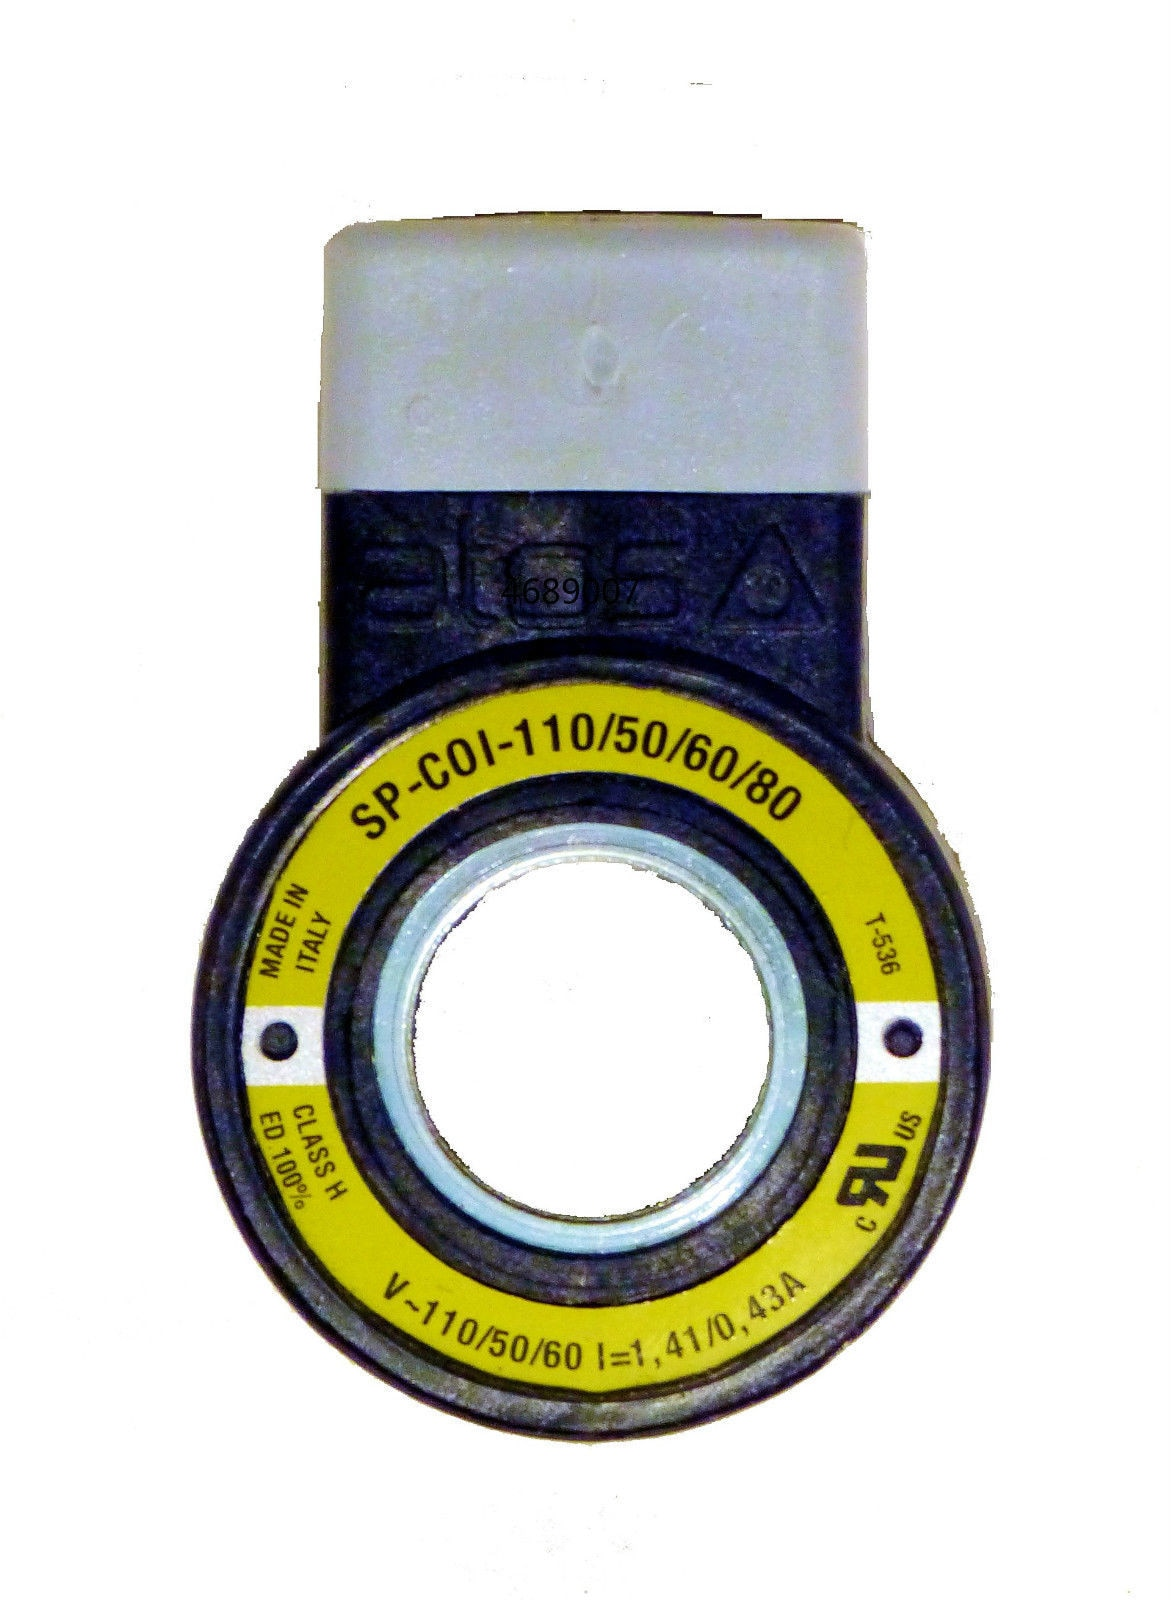 SP-COI-110/50/60/80 AC Atos imán-Spule de Ventil de bobina de solenoide de la válvula de SP-C01-110/50/60/80